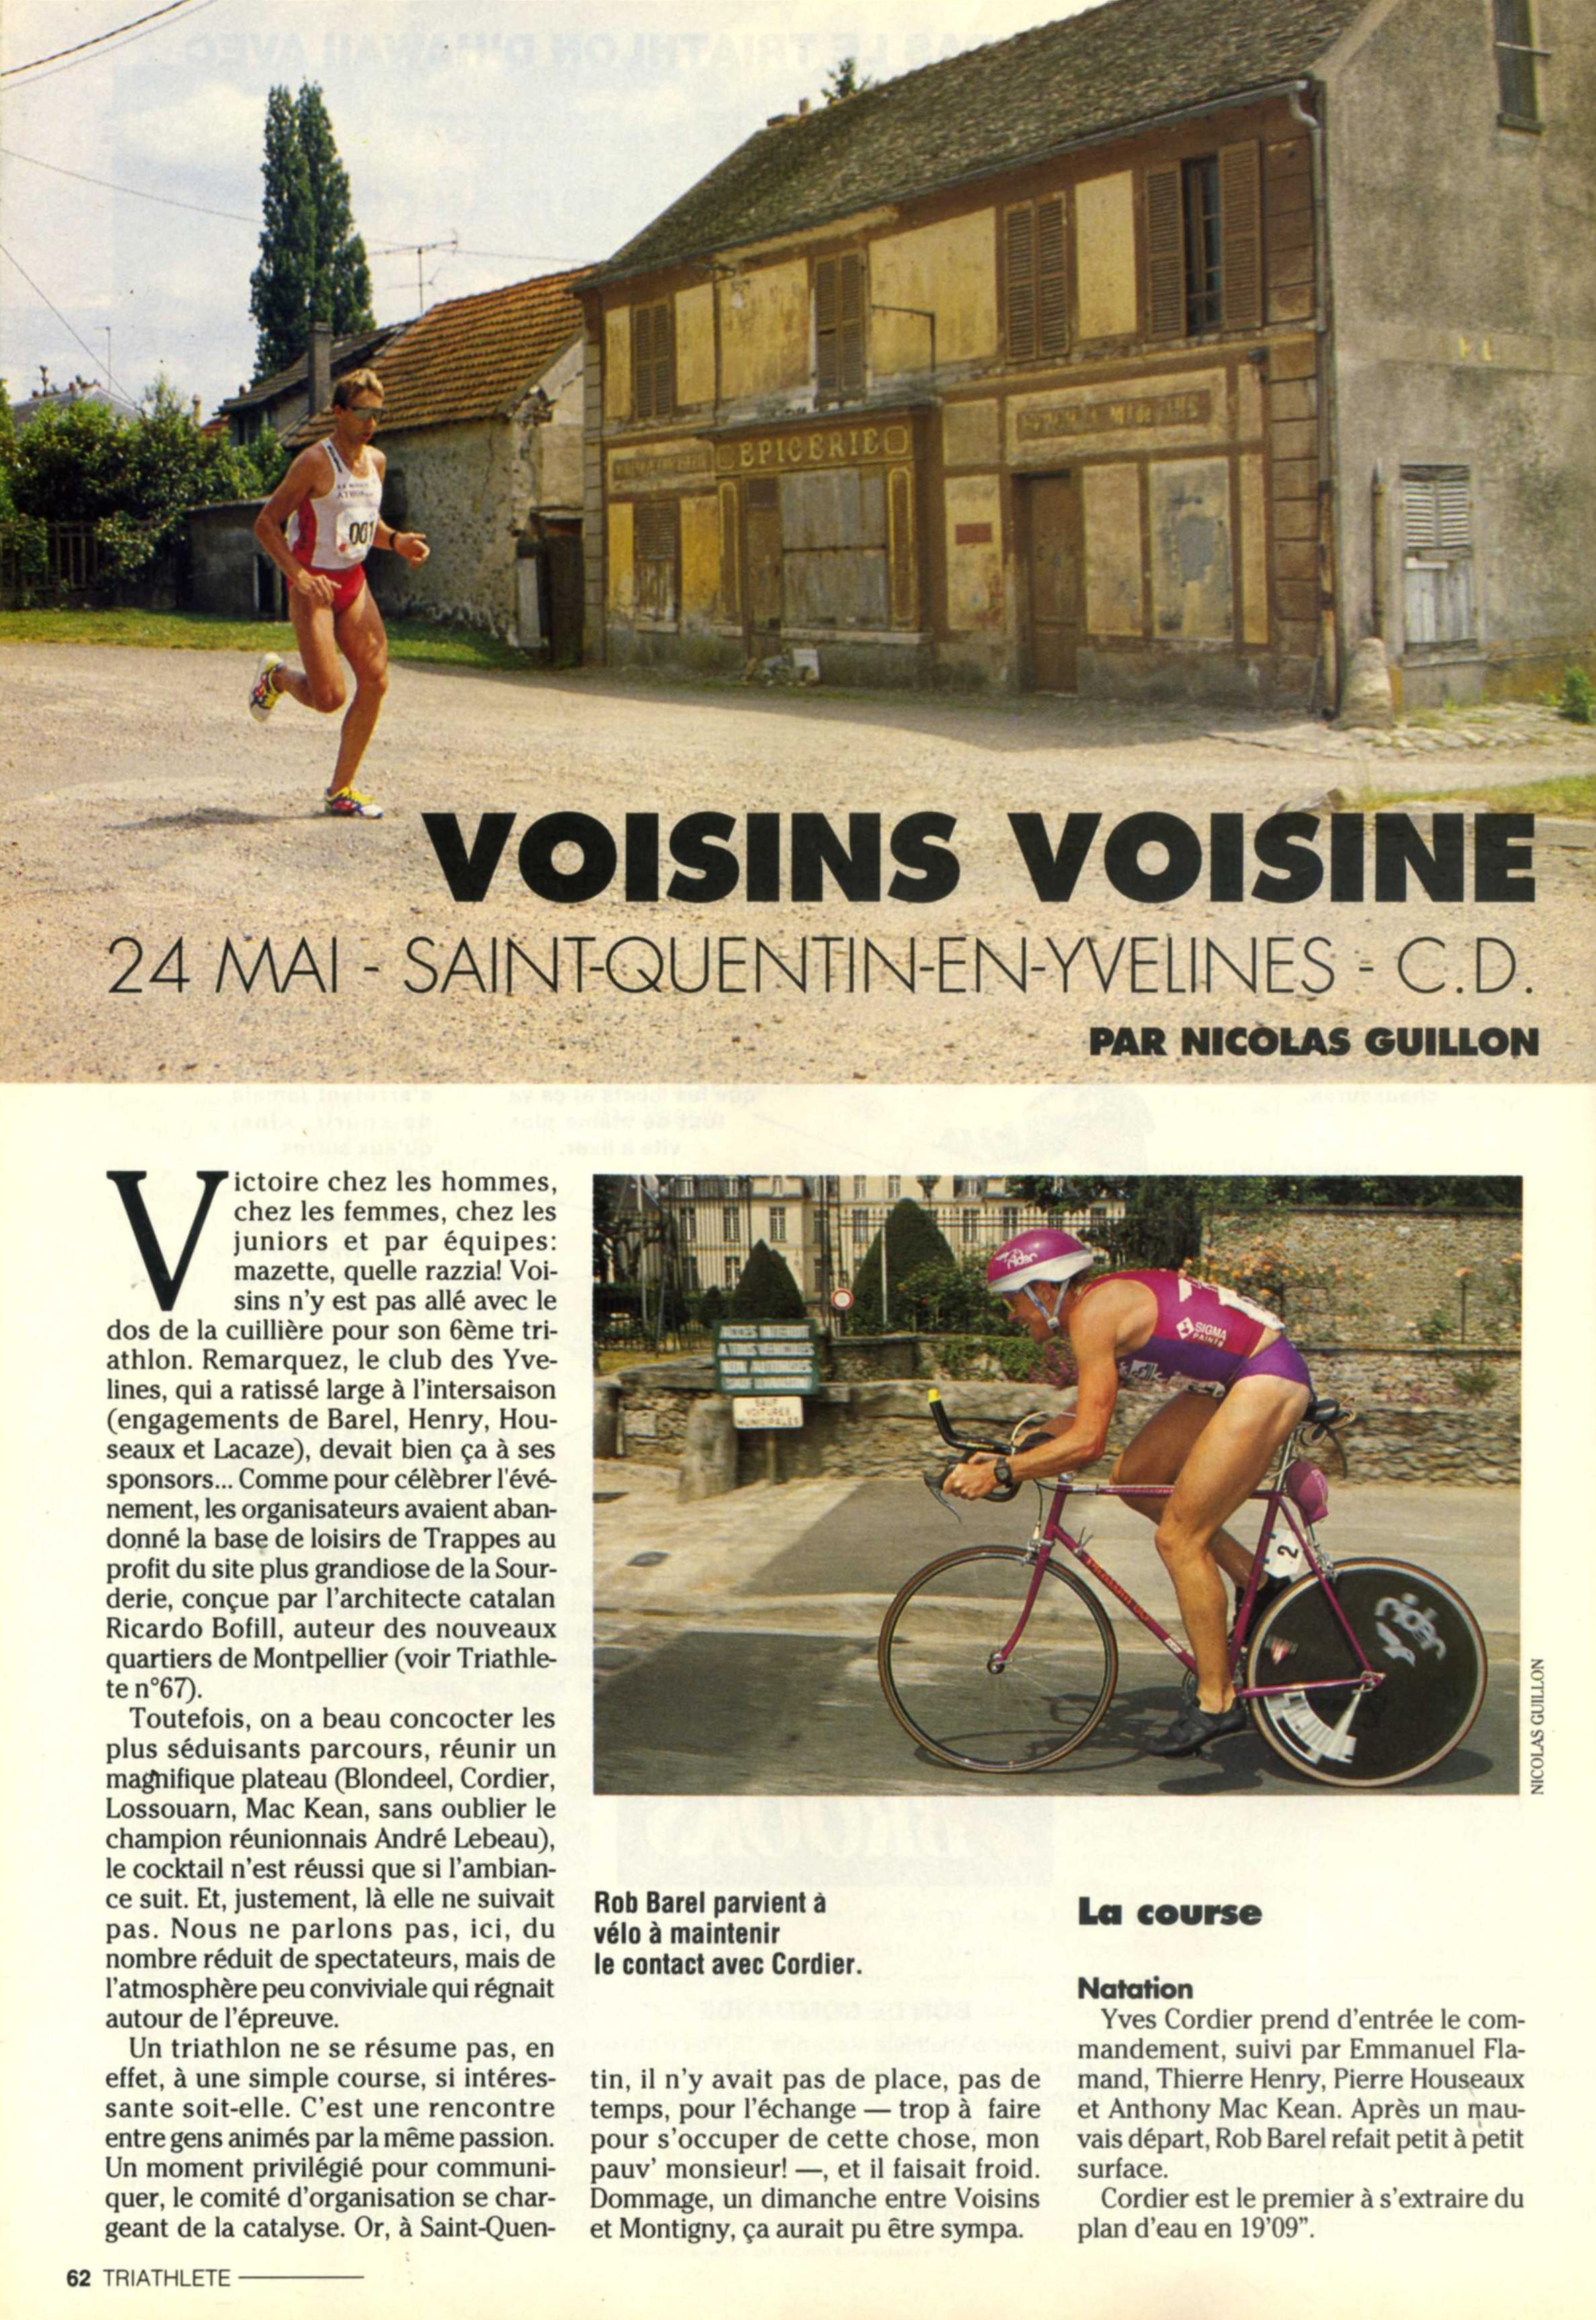 img[A]281_24-mai-1992_saint-quentin-en-yvelines